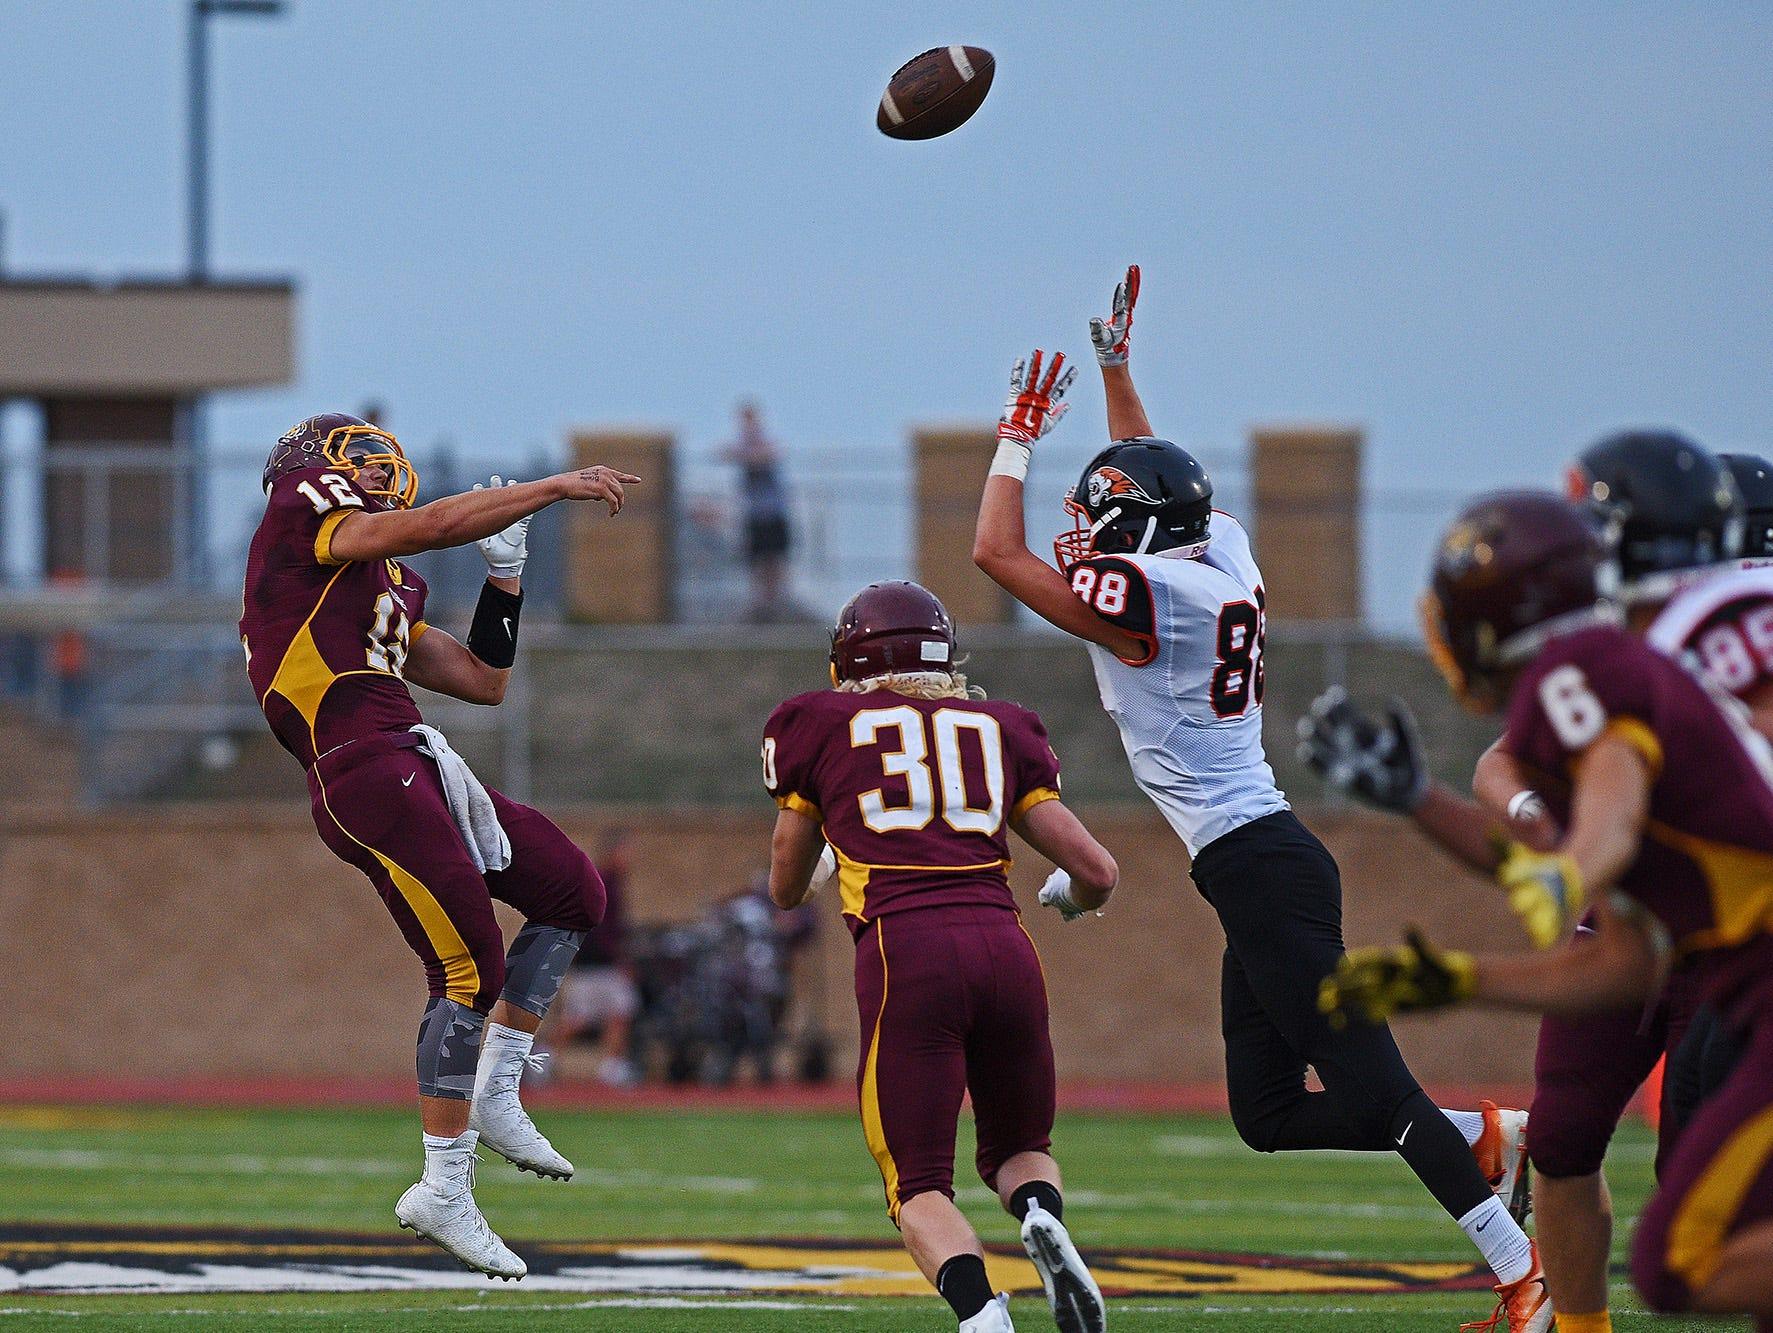 Harrisburg quarterback Hunter Headlee (12) throws a pass during a game against Huron at Harrisburg High School Friday, Sept. 2, 2016, in Harrisburg, S.D.